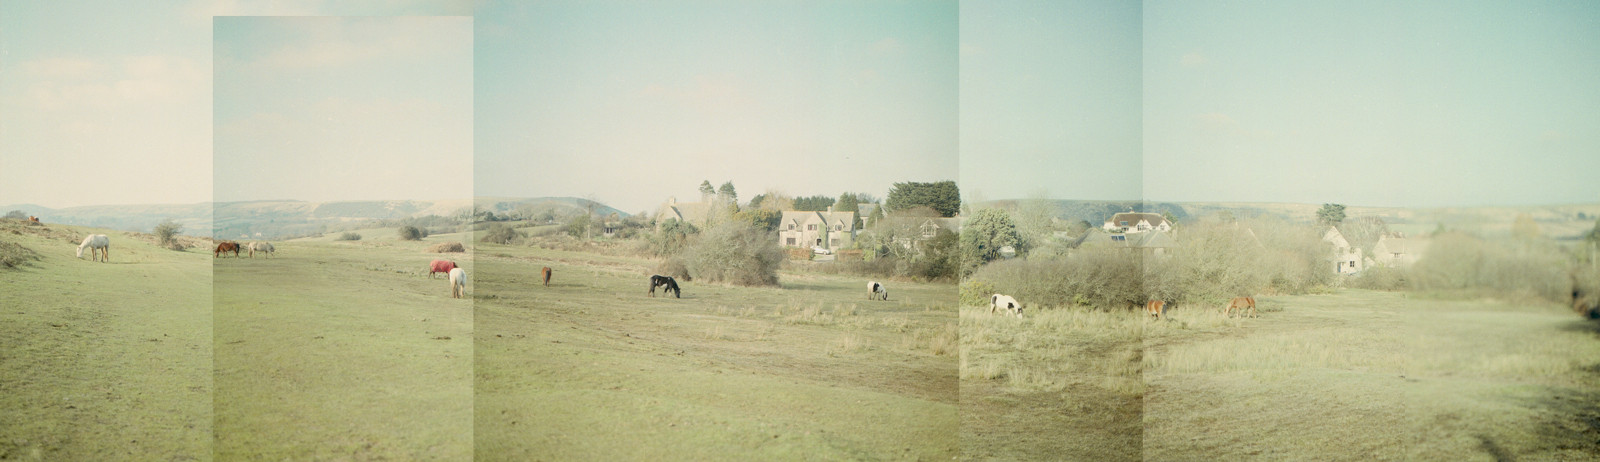 herd.rs.jpg